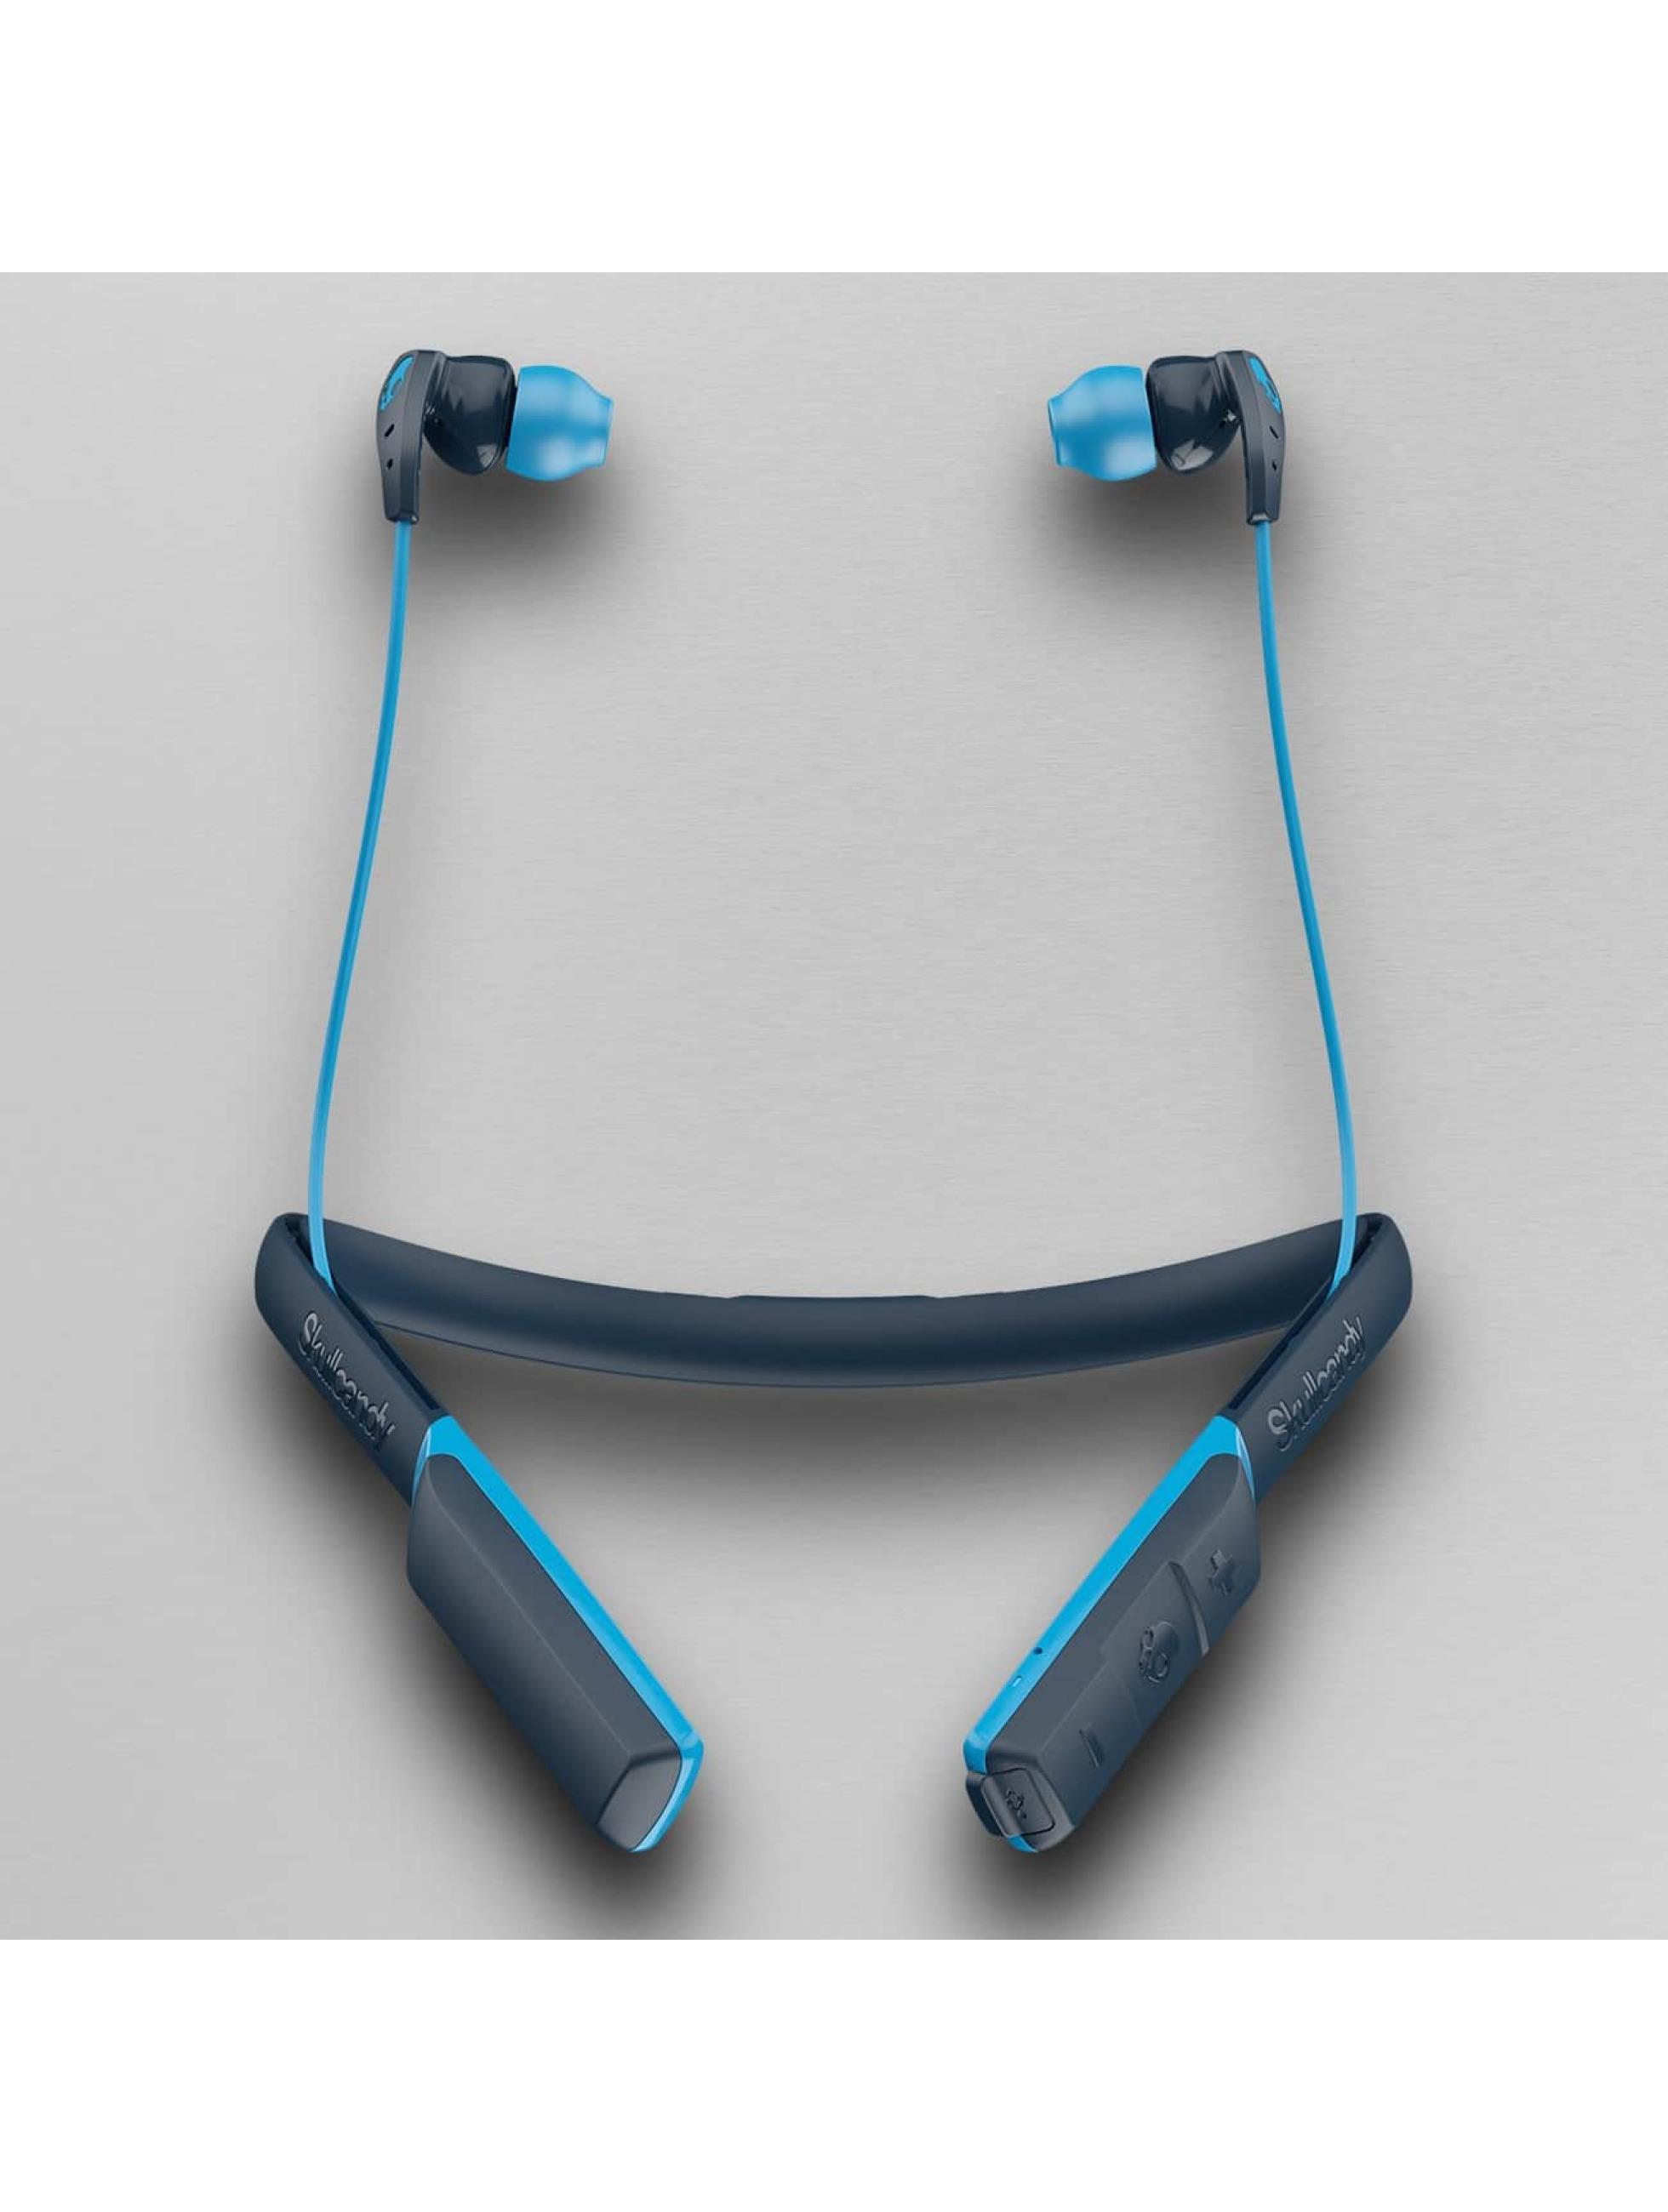 Skullcandy Headphone Method Wireless blue